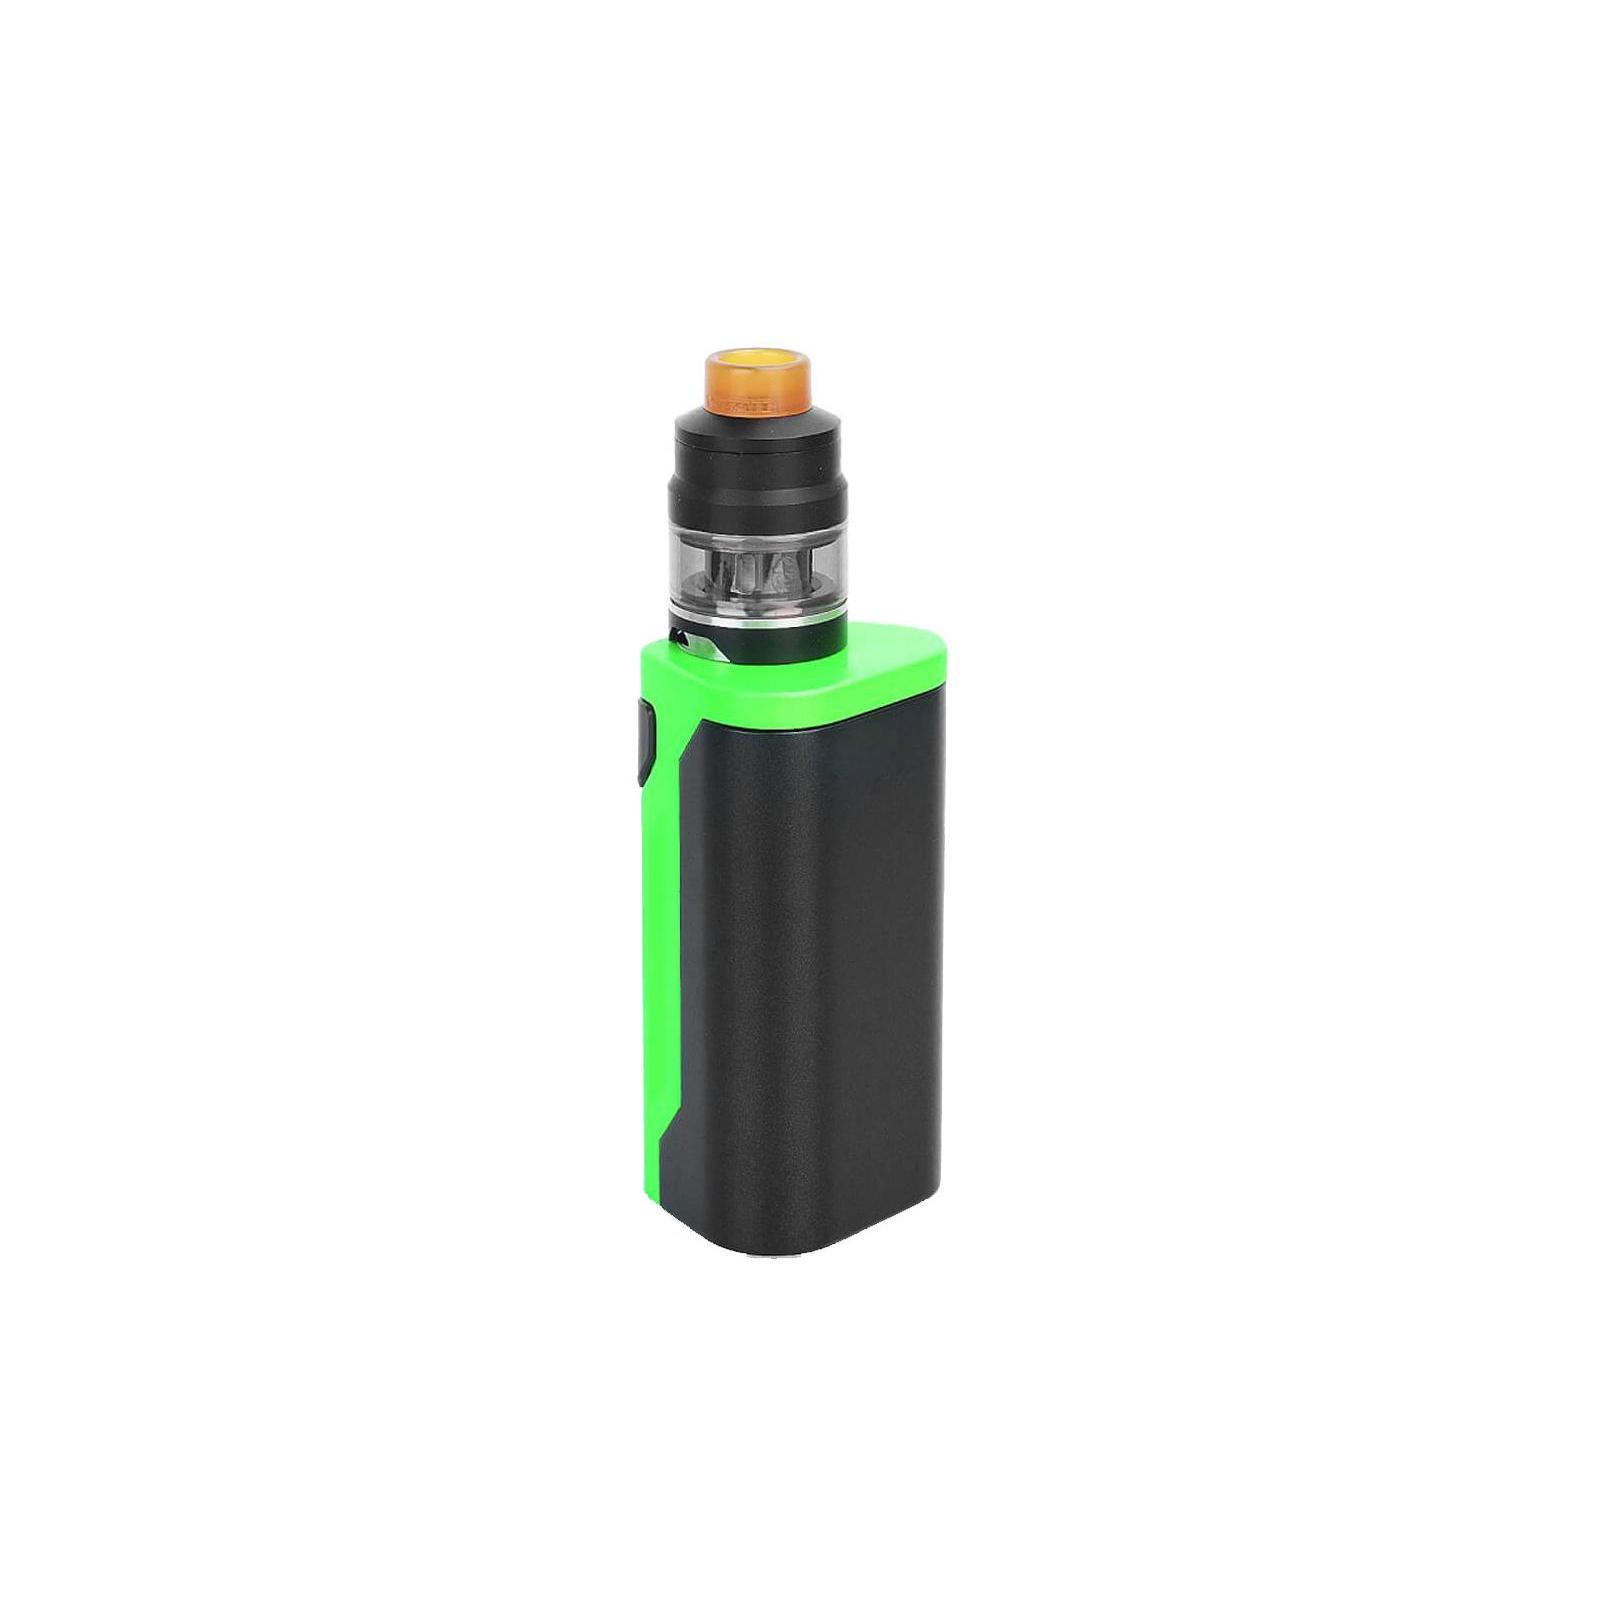 Стартовый набор Wismec Reuleaux RX2 20700 with Gnome Tank Kit Green (WISRX2KGR) изображение 2